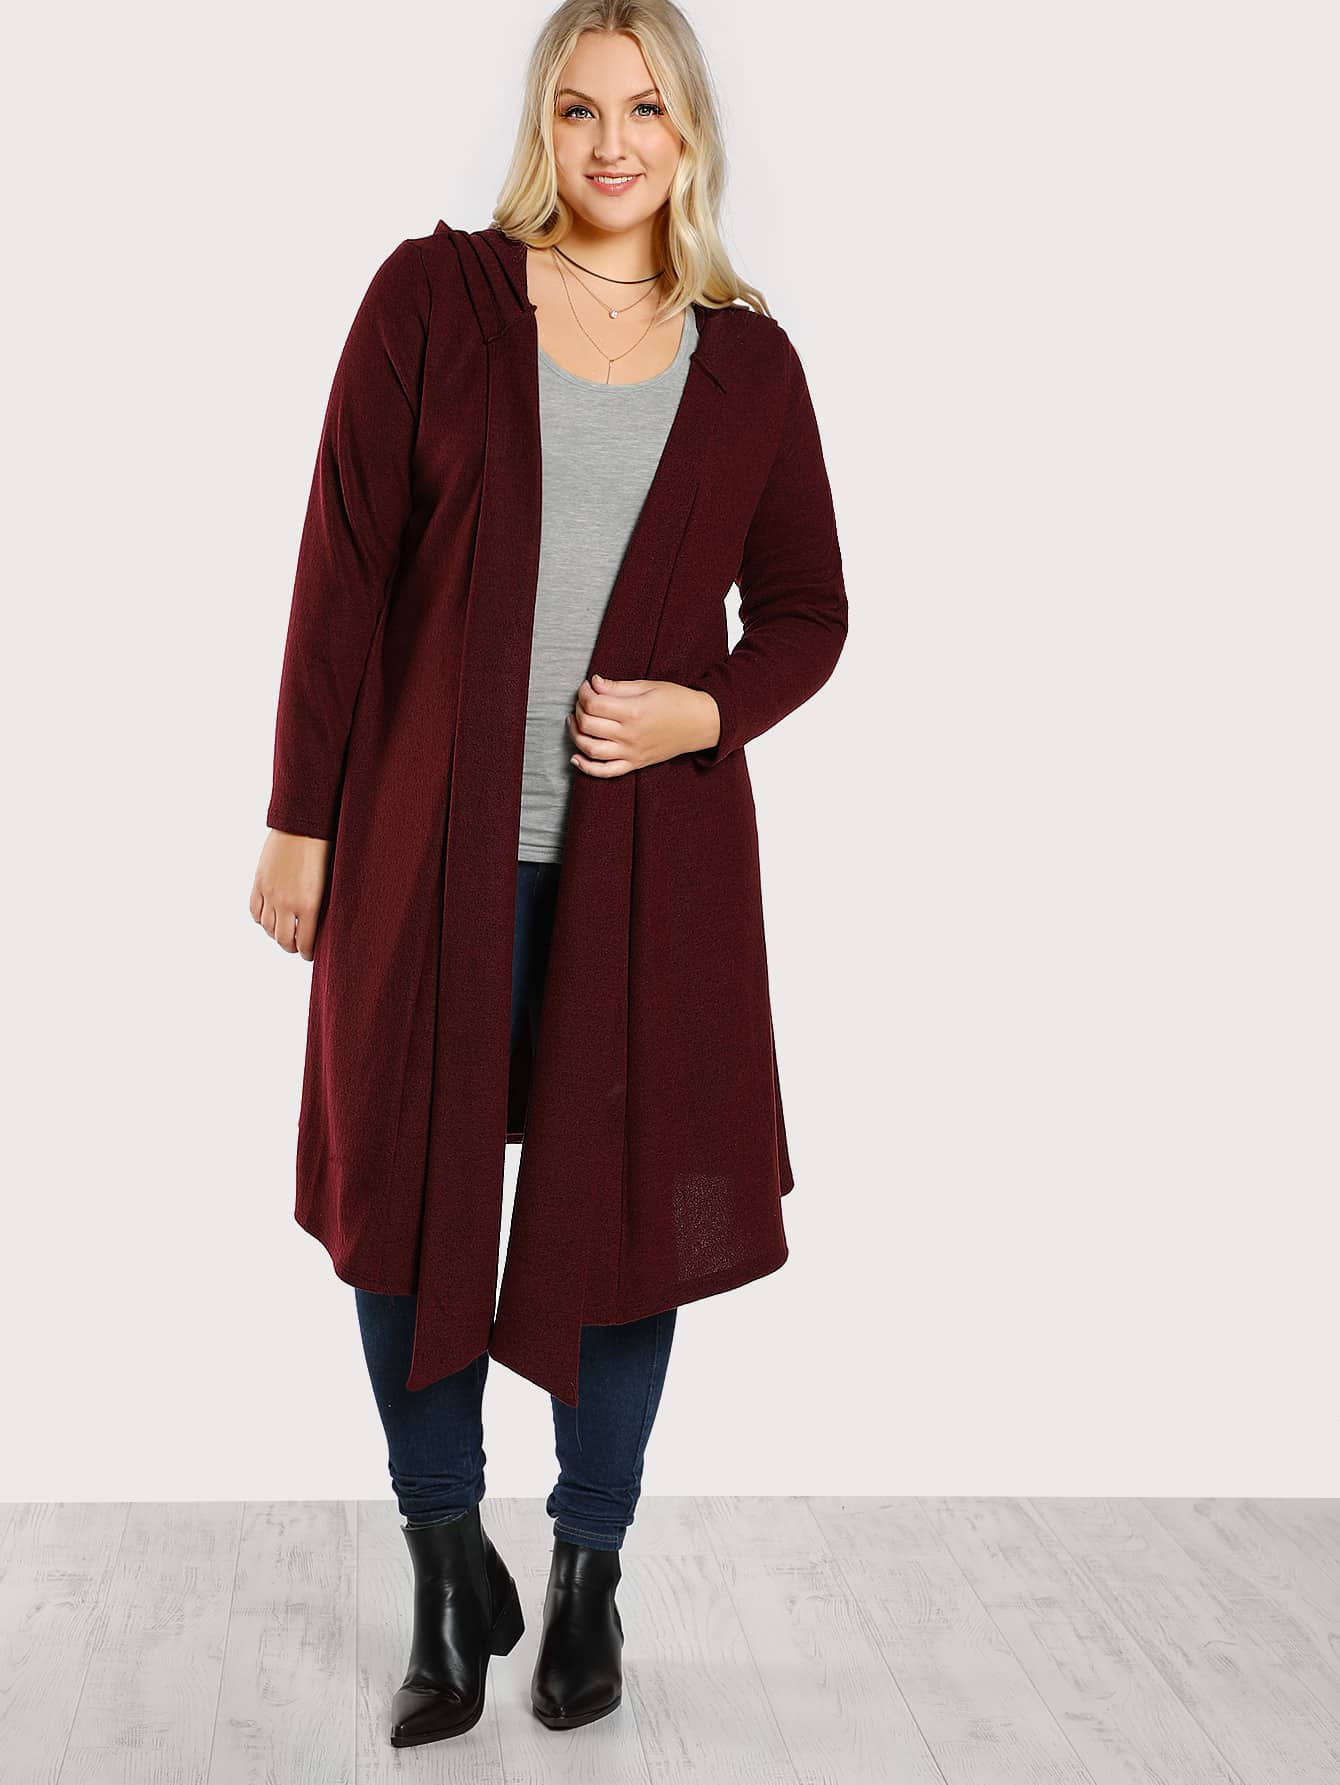 Hooded Soft Knit Longline Cardigan